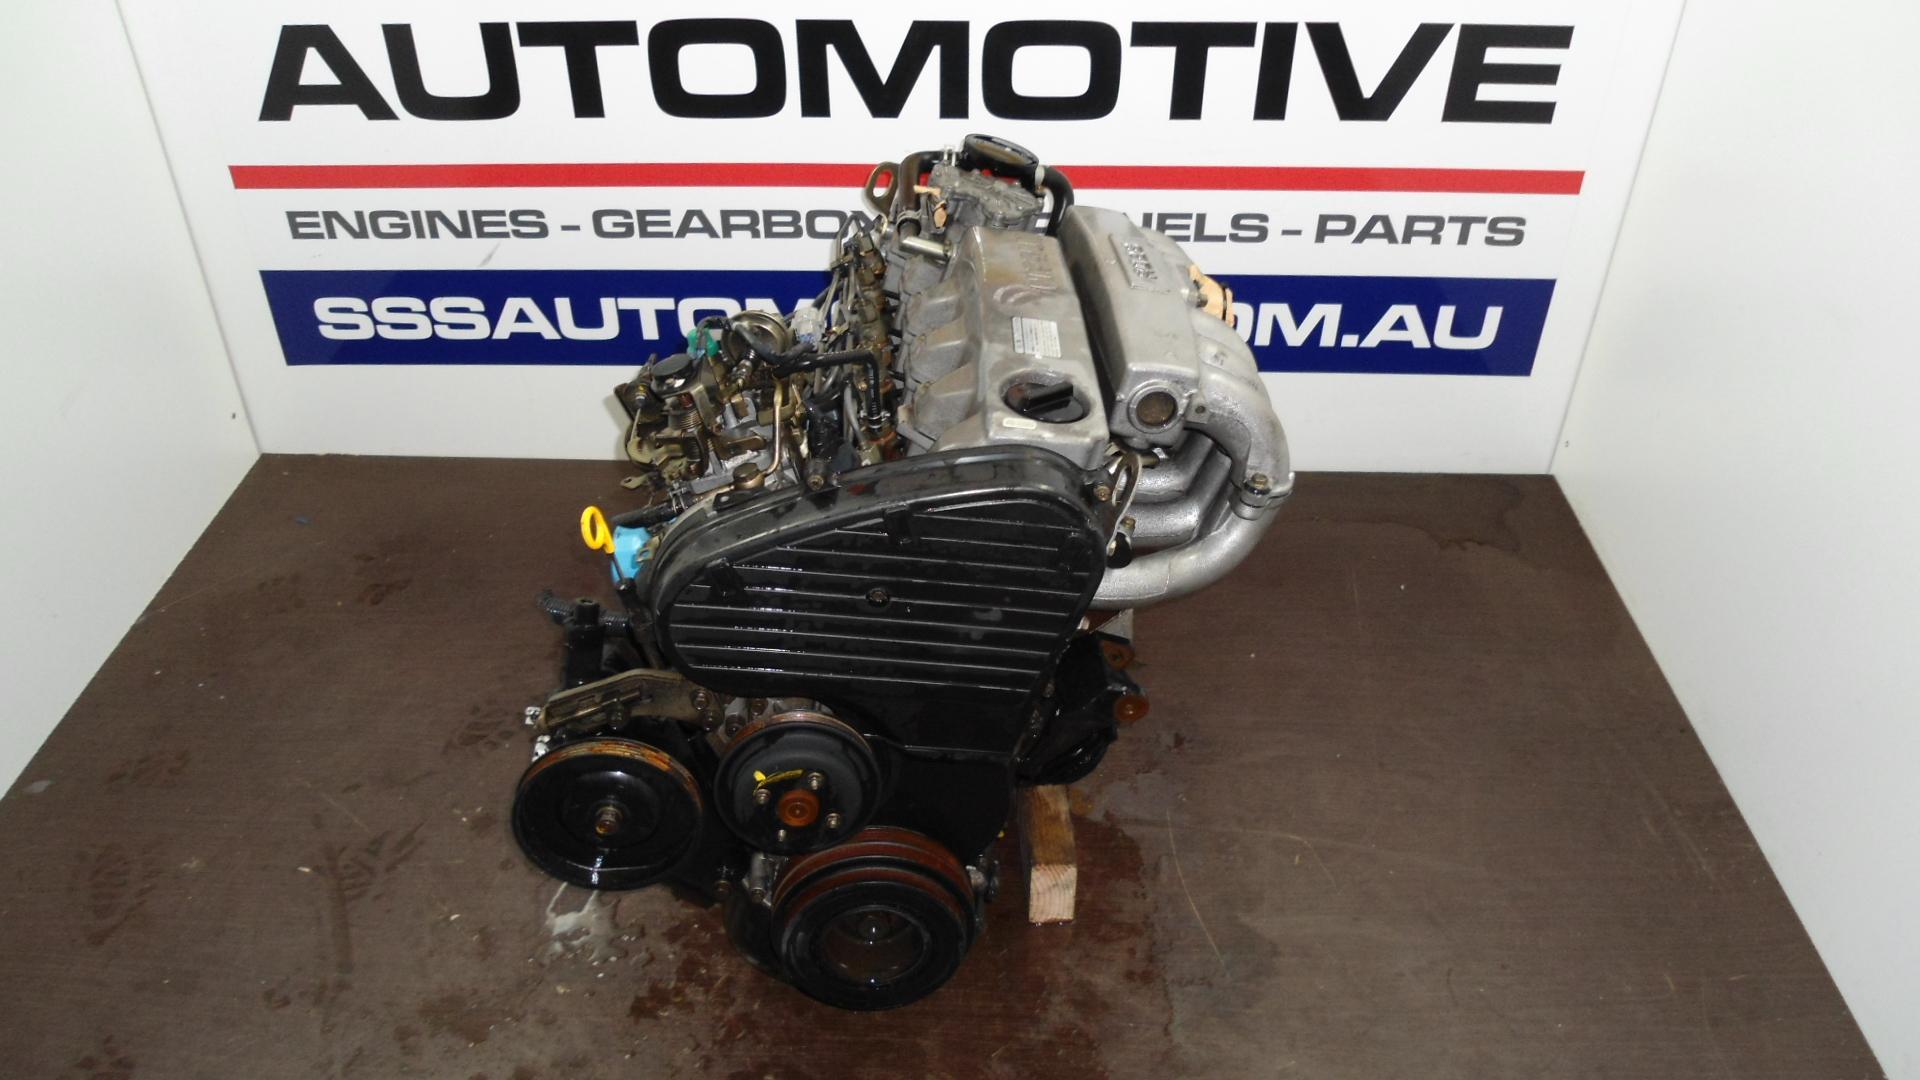 Nissan Ld28 Parts